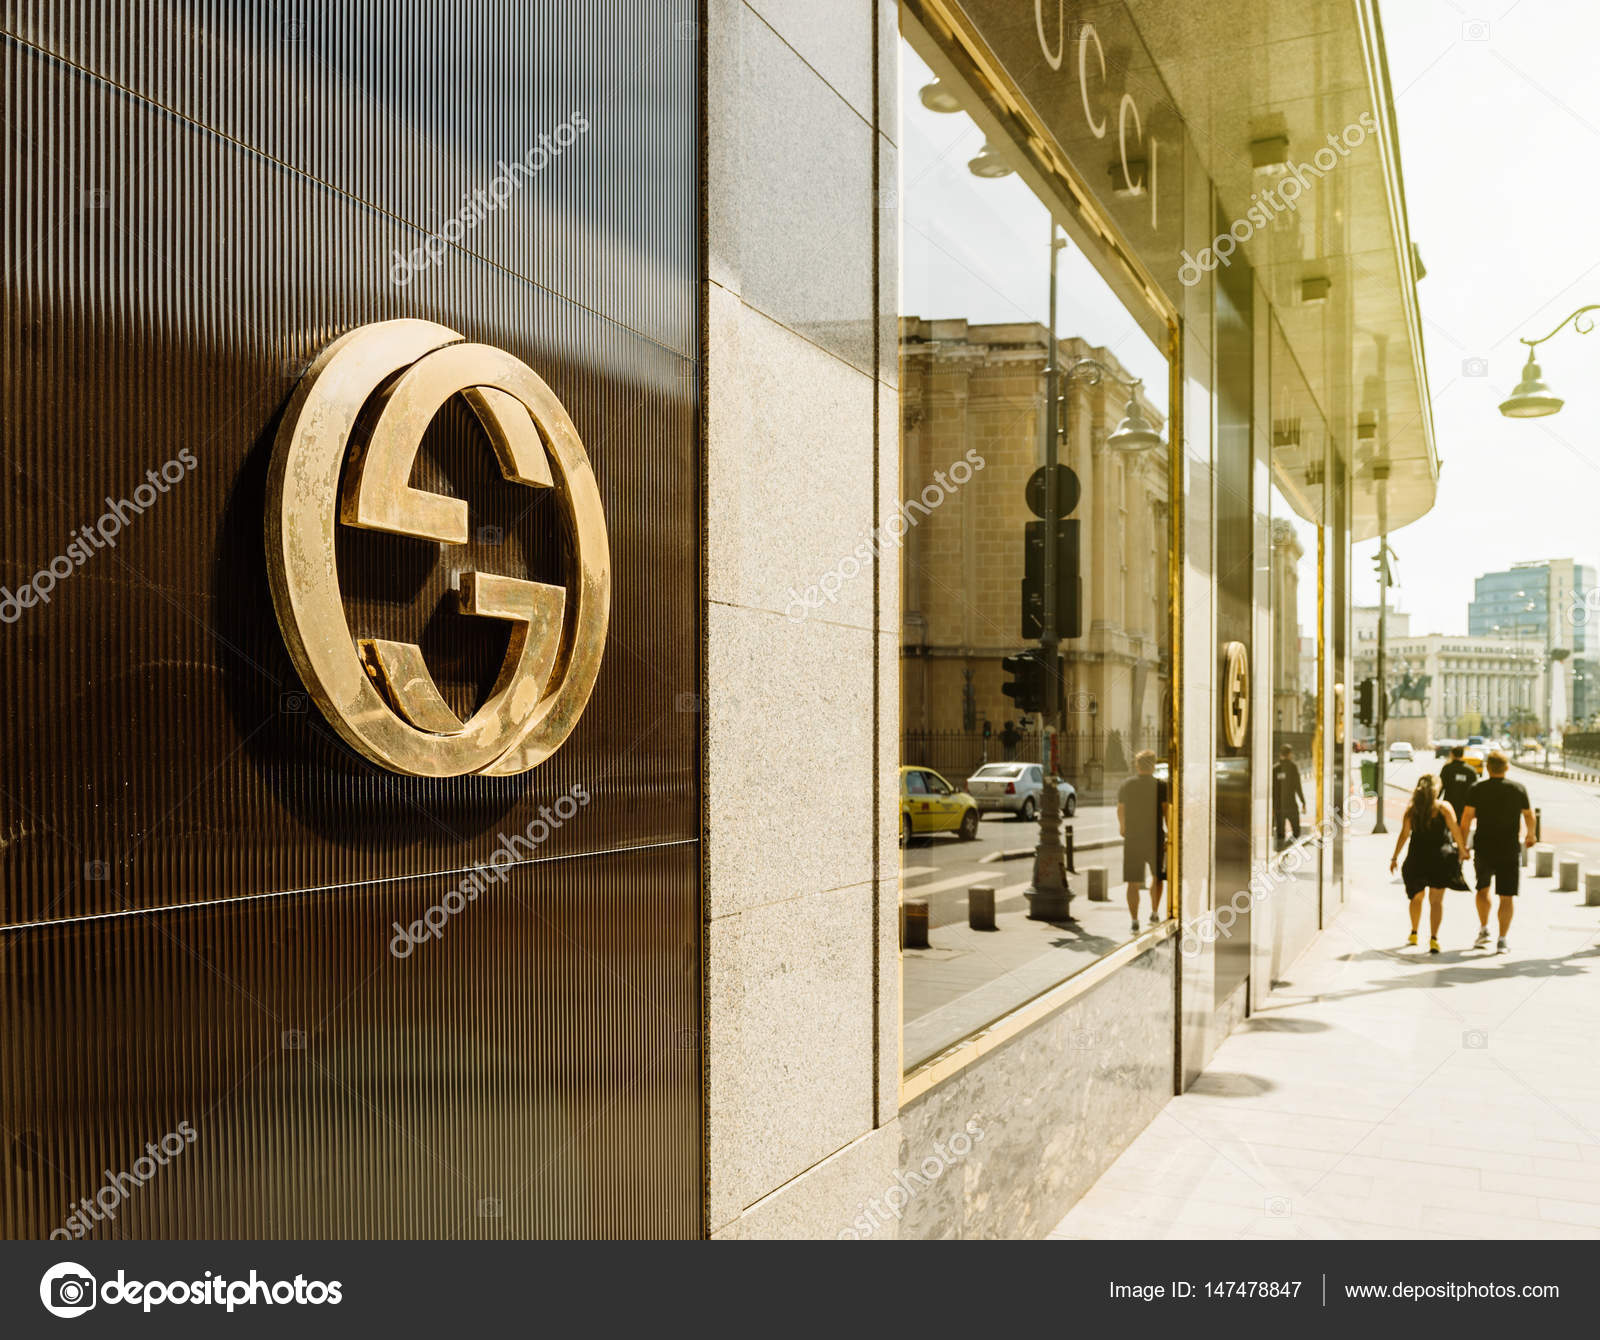 8a558d68d Bucarest, Francia - 01 de abril de 2016: Gucci muestra insignia en la moda  tienda oficial boutique flagship store en Bucarest. Gucci es una marca de  lujo ...